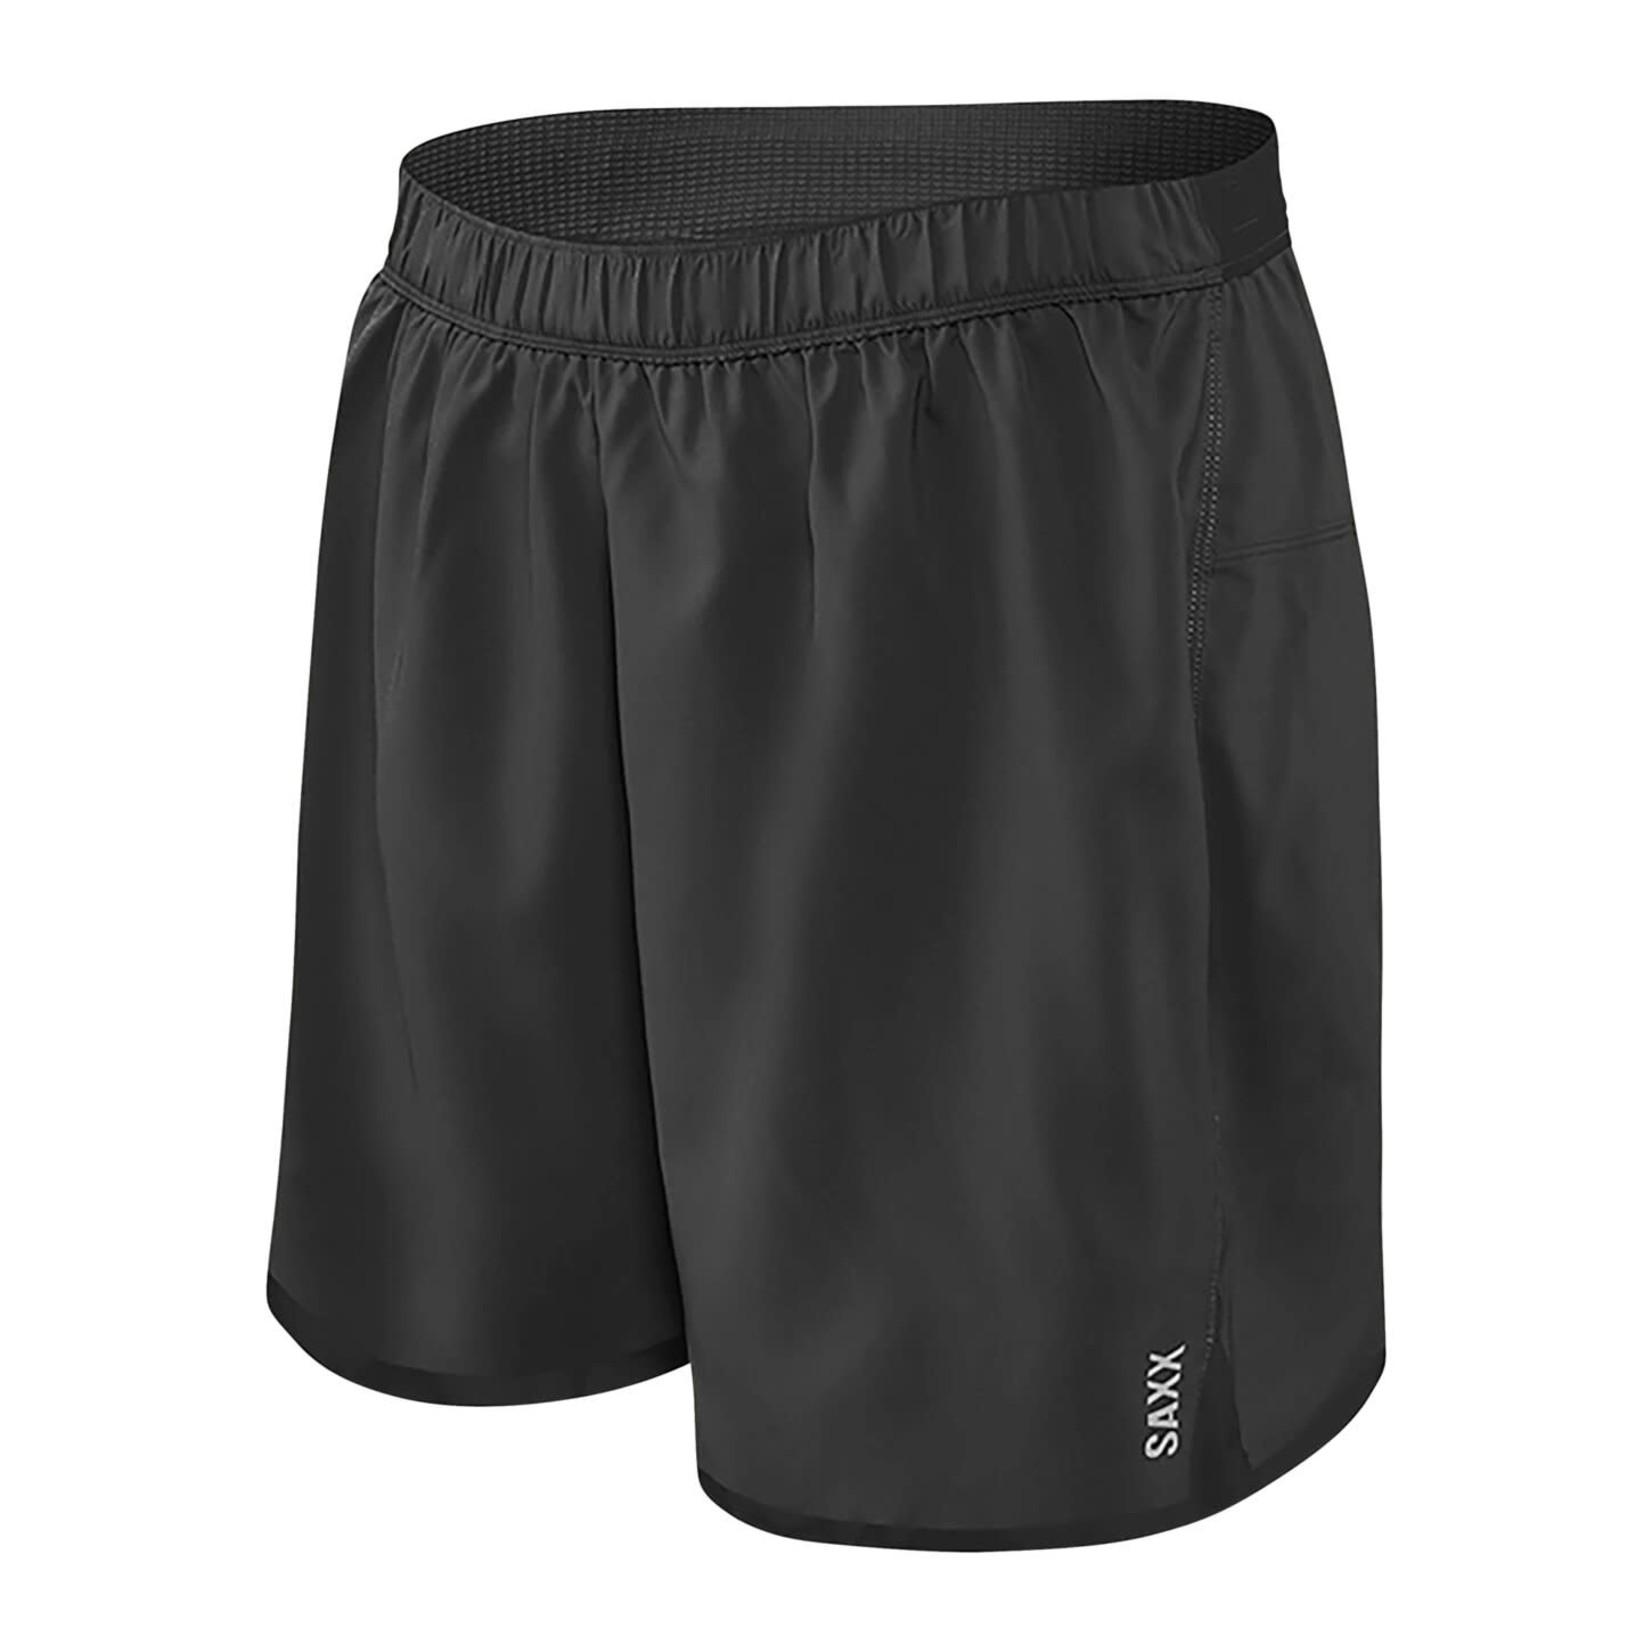 Saxx Pilot Shorts 2 Colors